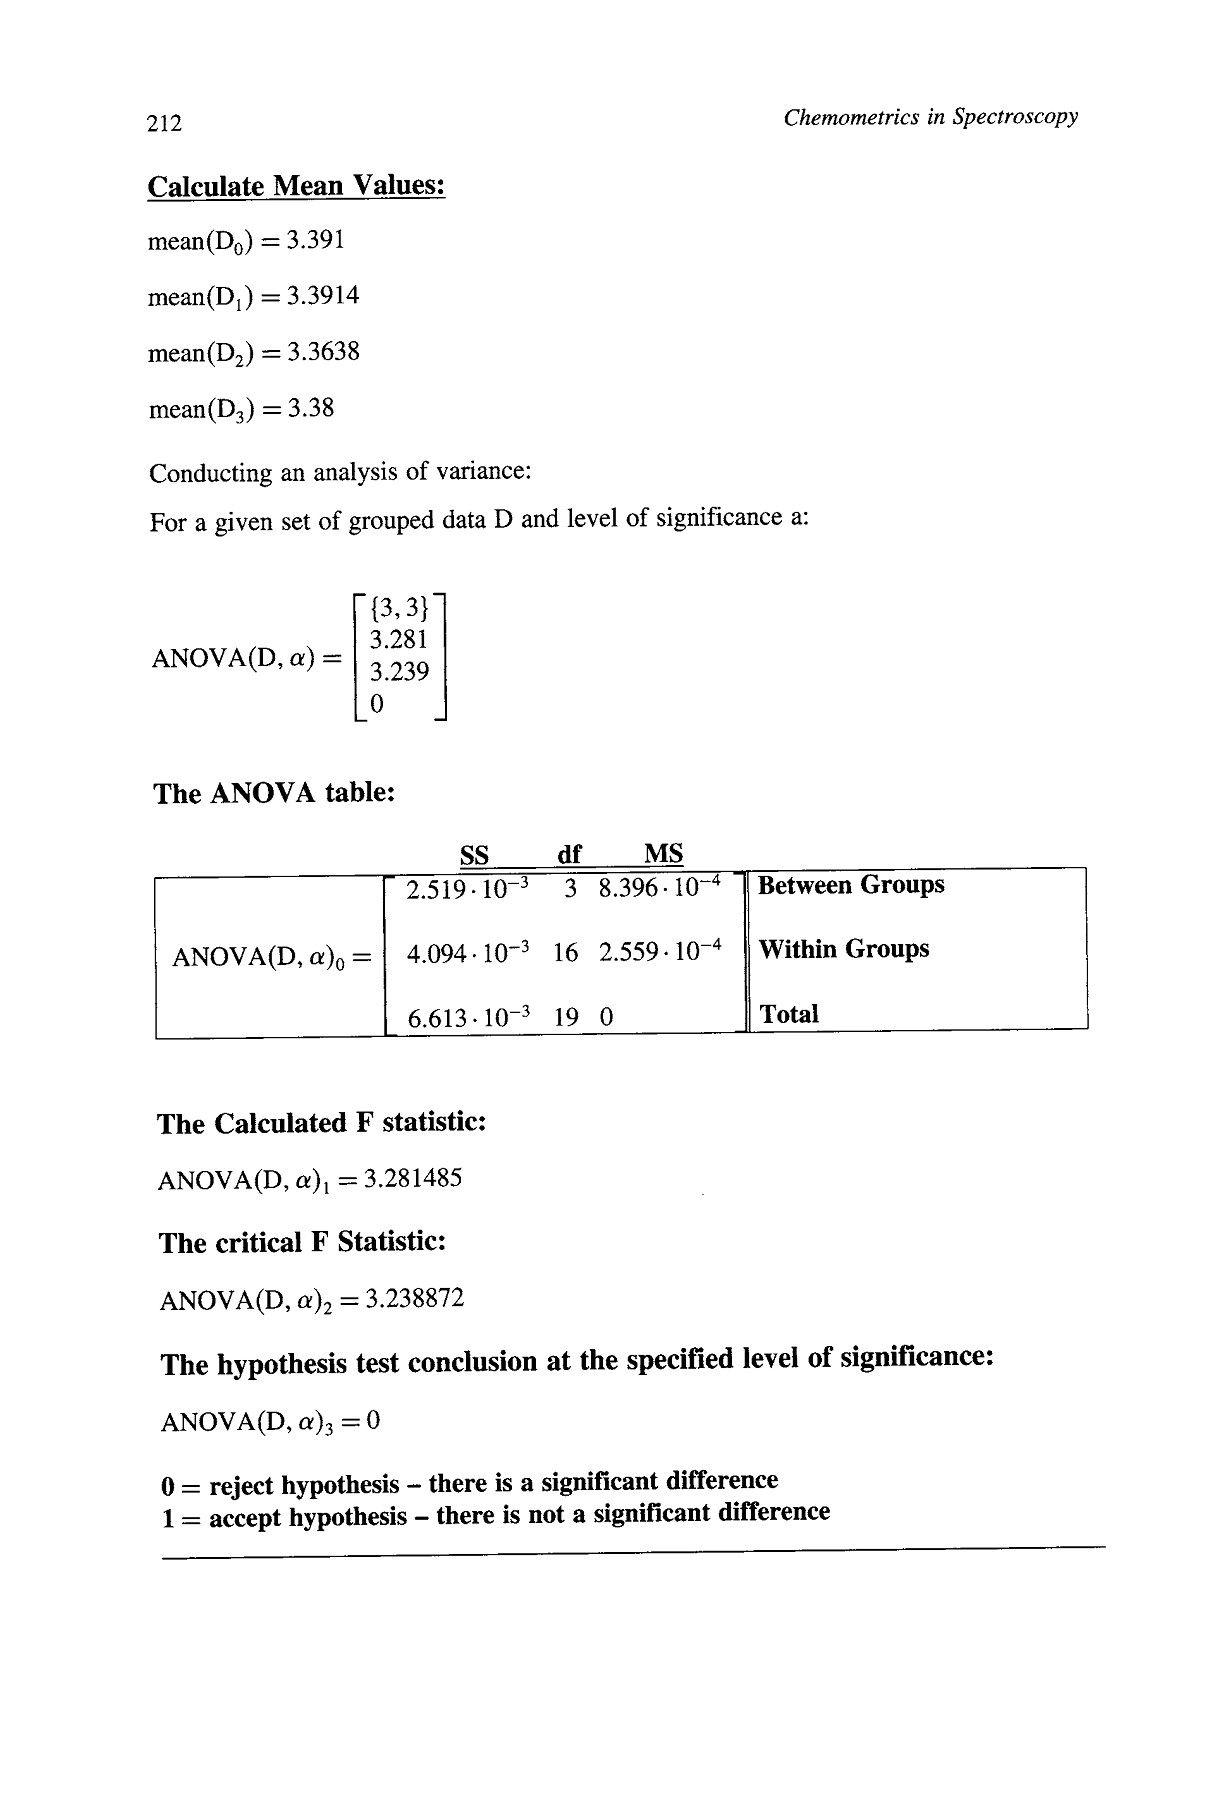 10 Worksheets Adding Fractions 2 2 Pretty Worksheets